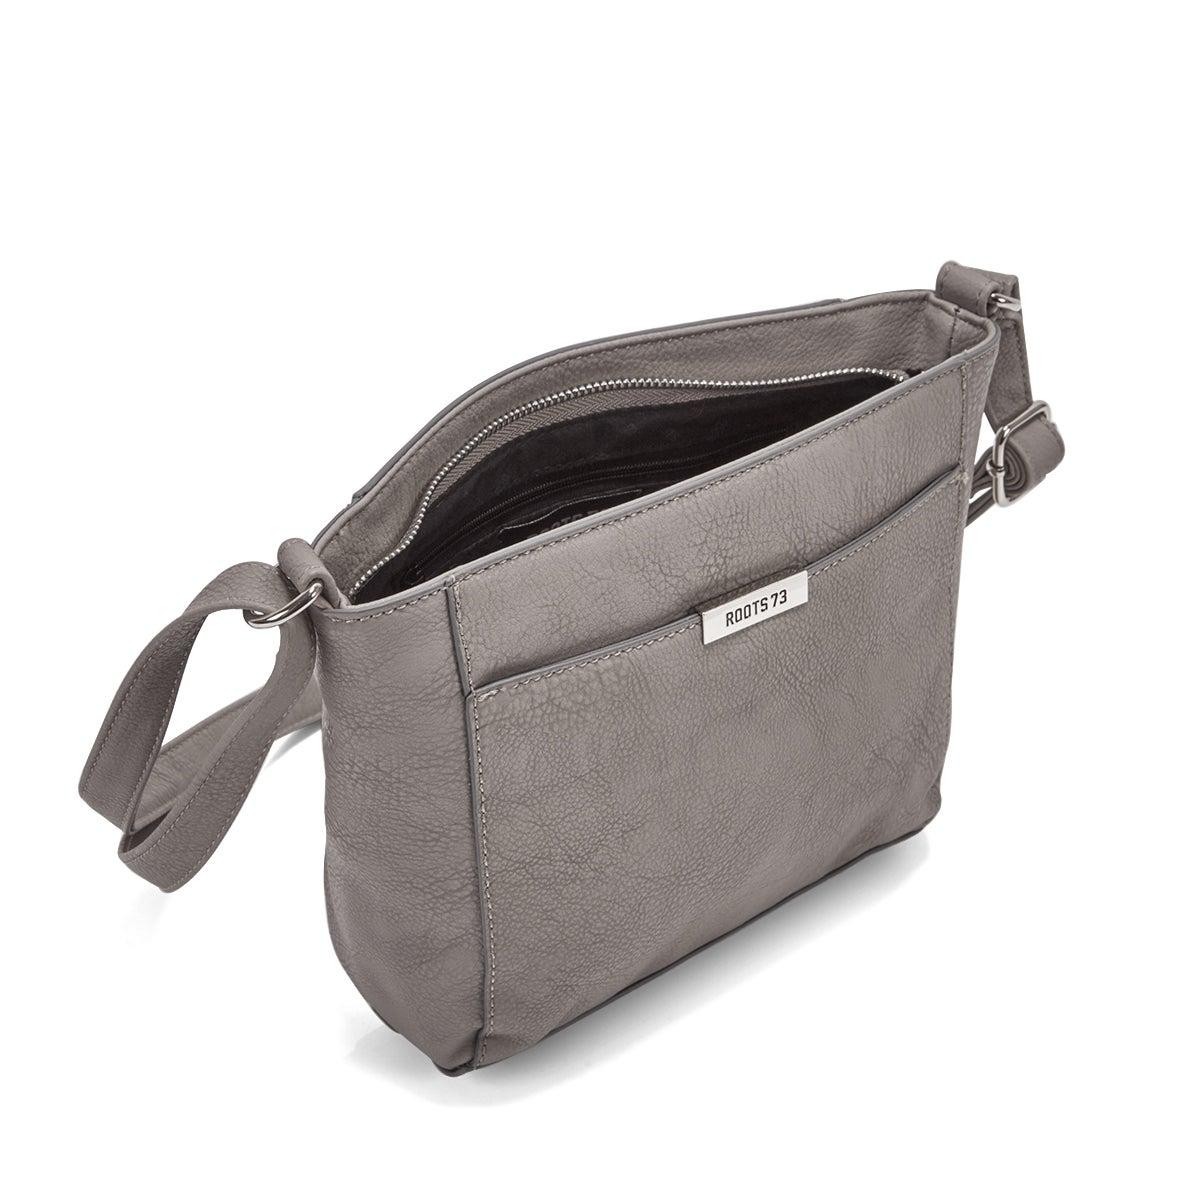 Lds grey top zip closure shoulder bag